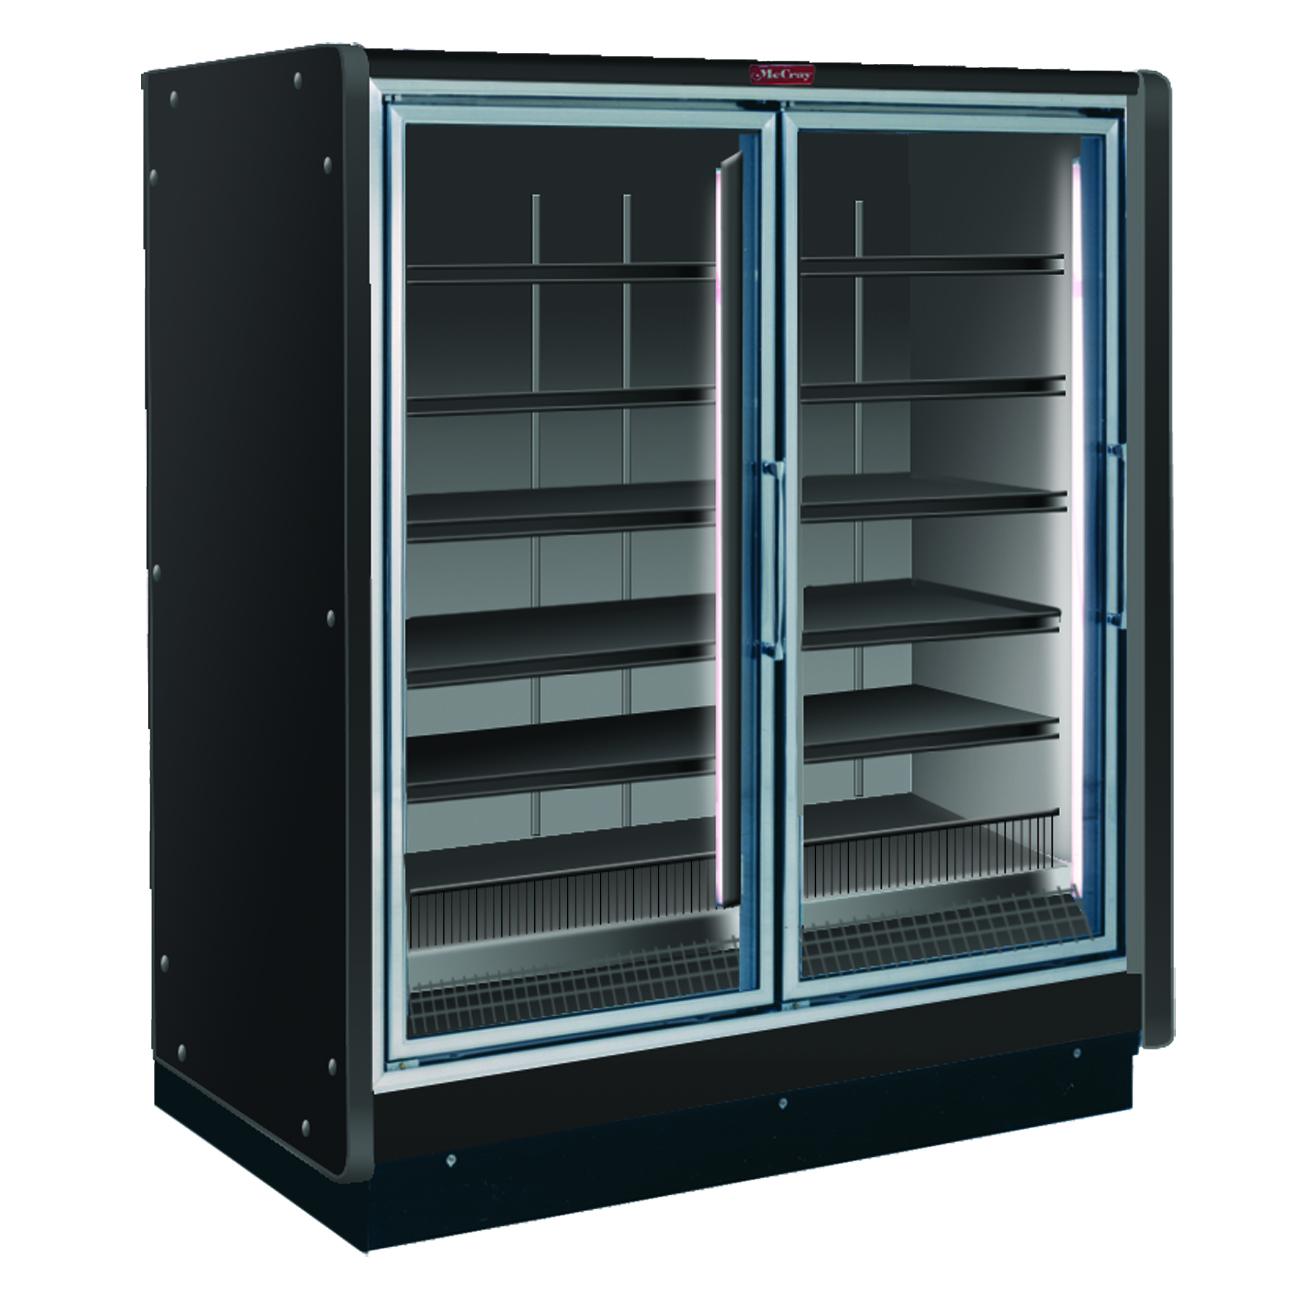 Howard-McCray RIN2-30-LED-B refrigerator, merchandiser